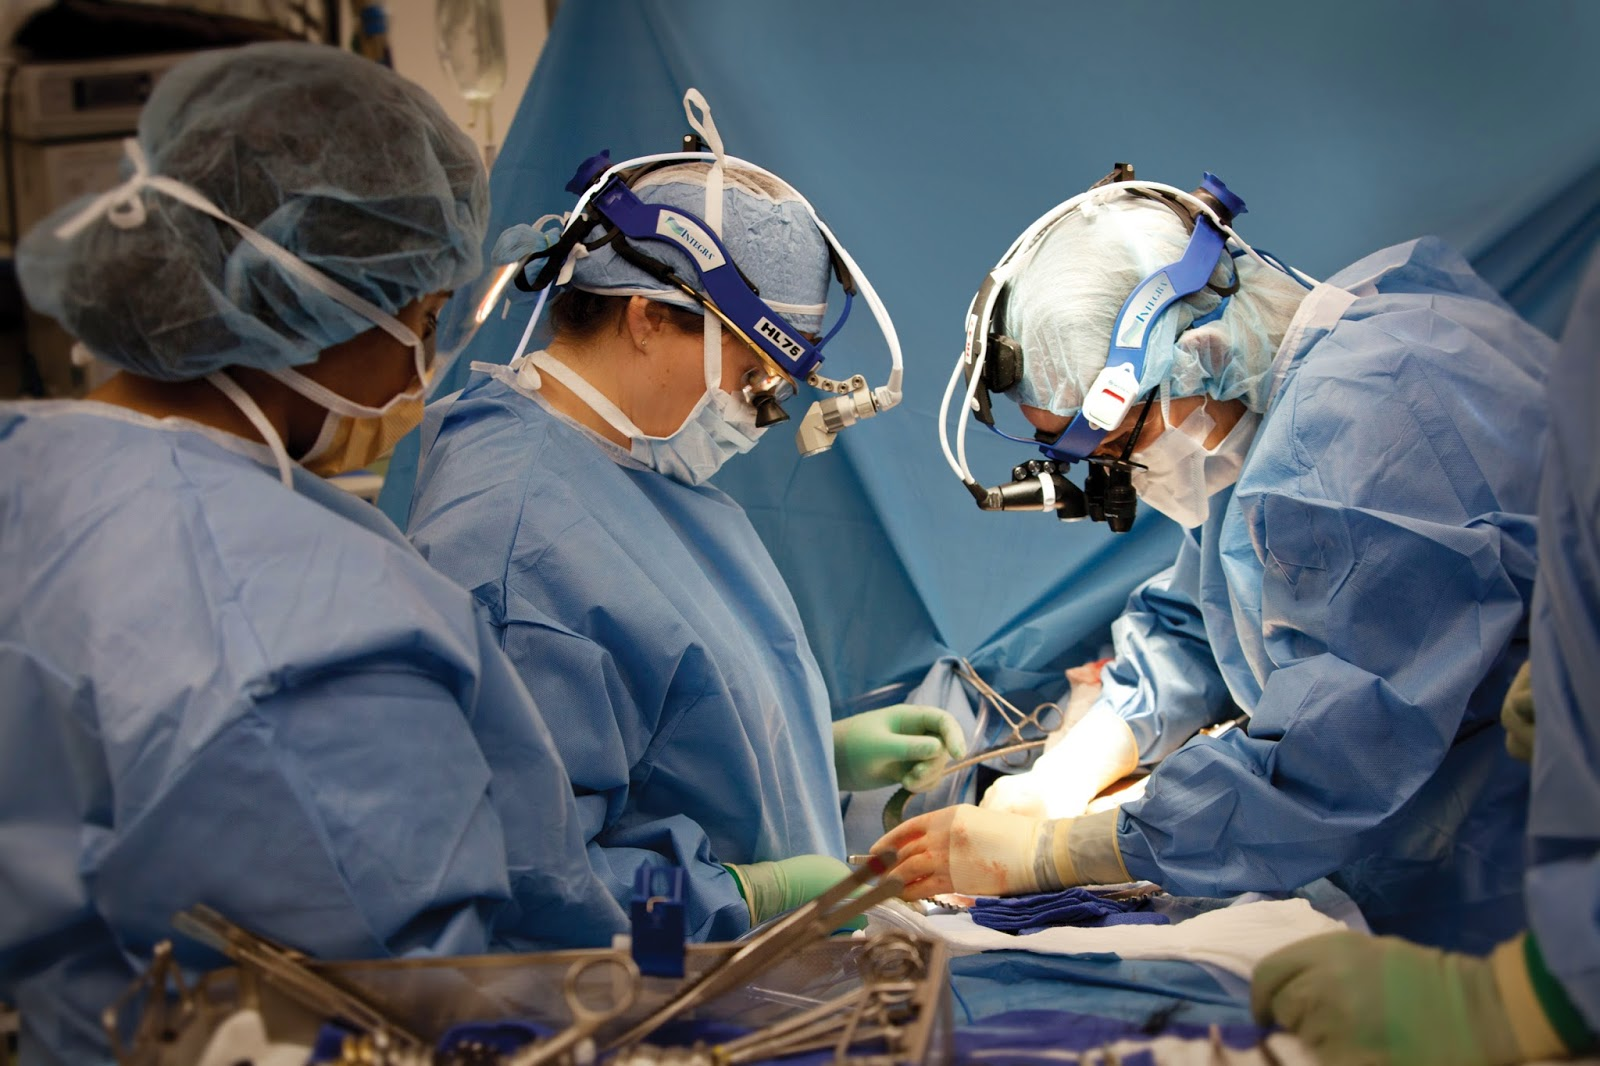 Cirujanos fantasmas